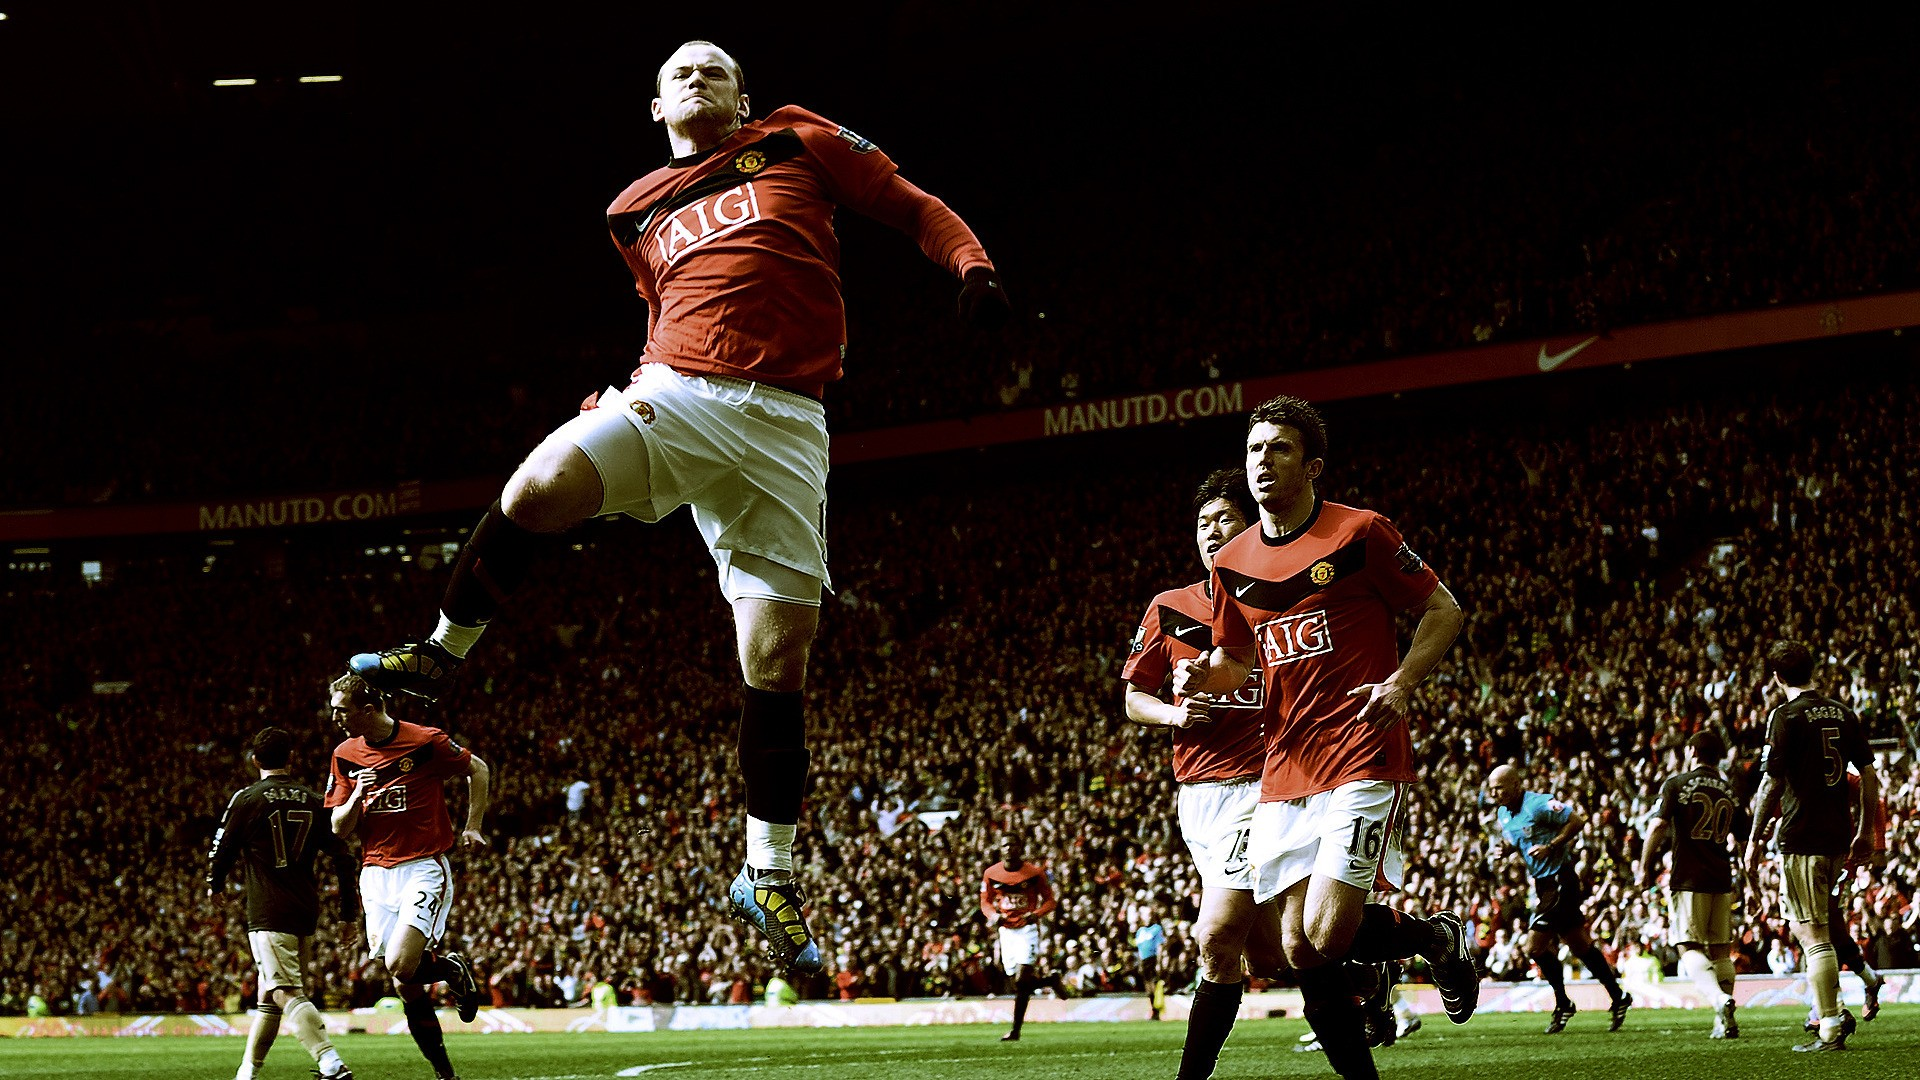 Wayne Rooney Manchester United Hd Wallpaper Hd Wallpapers